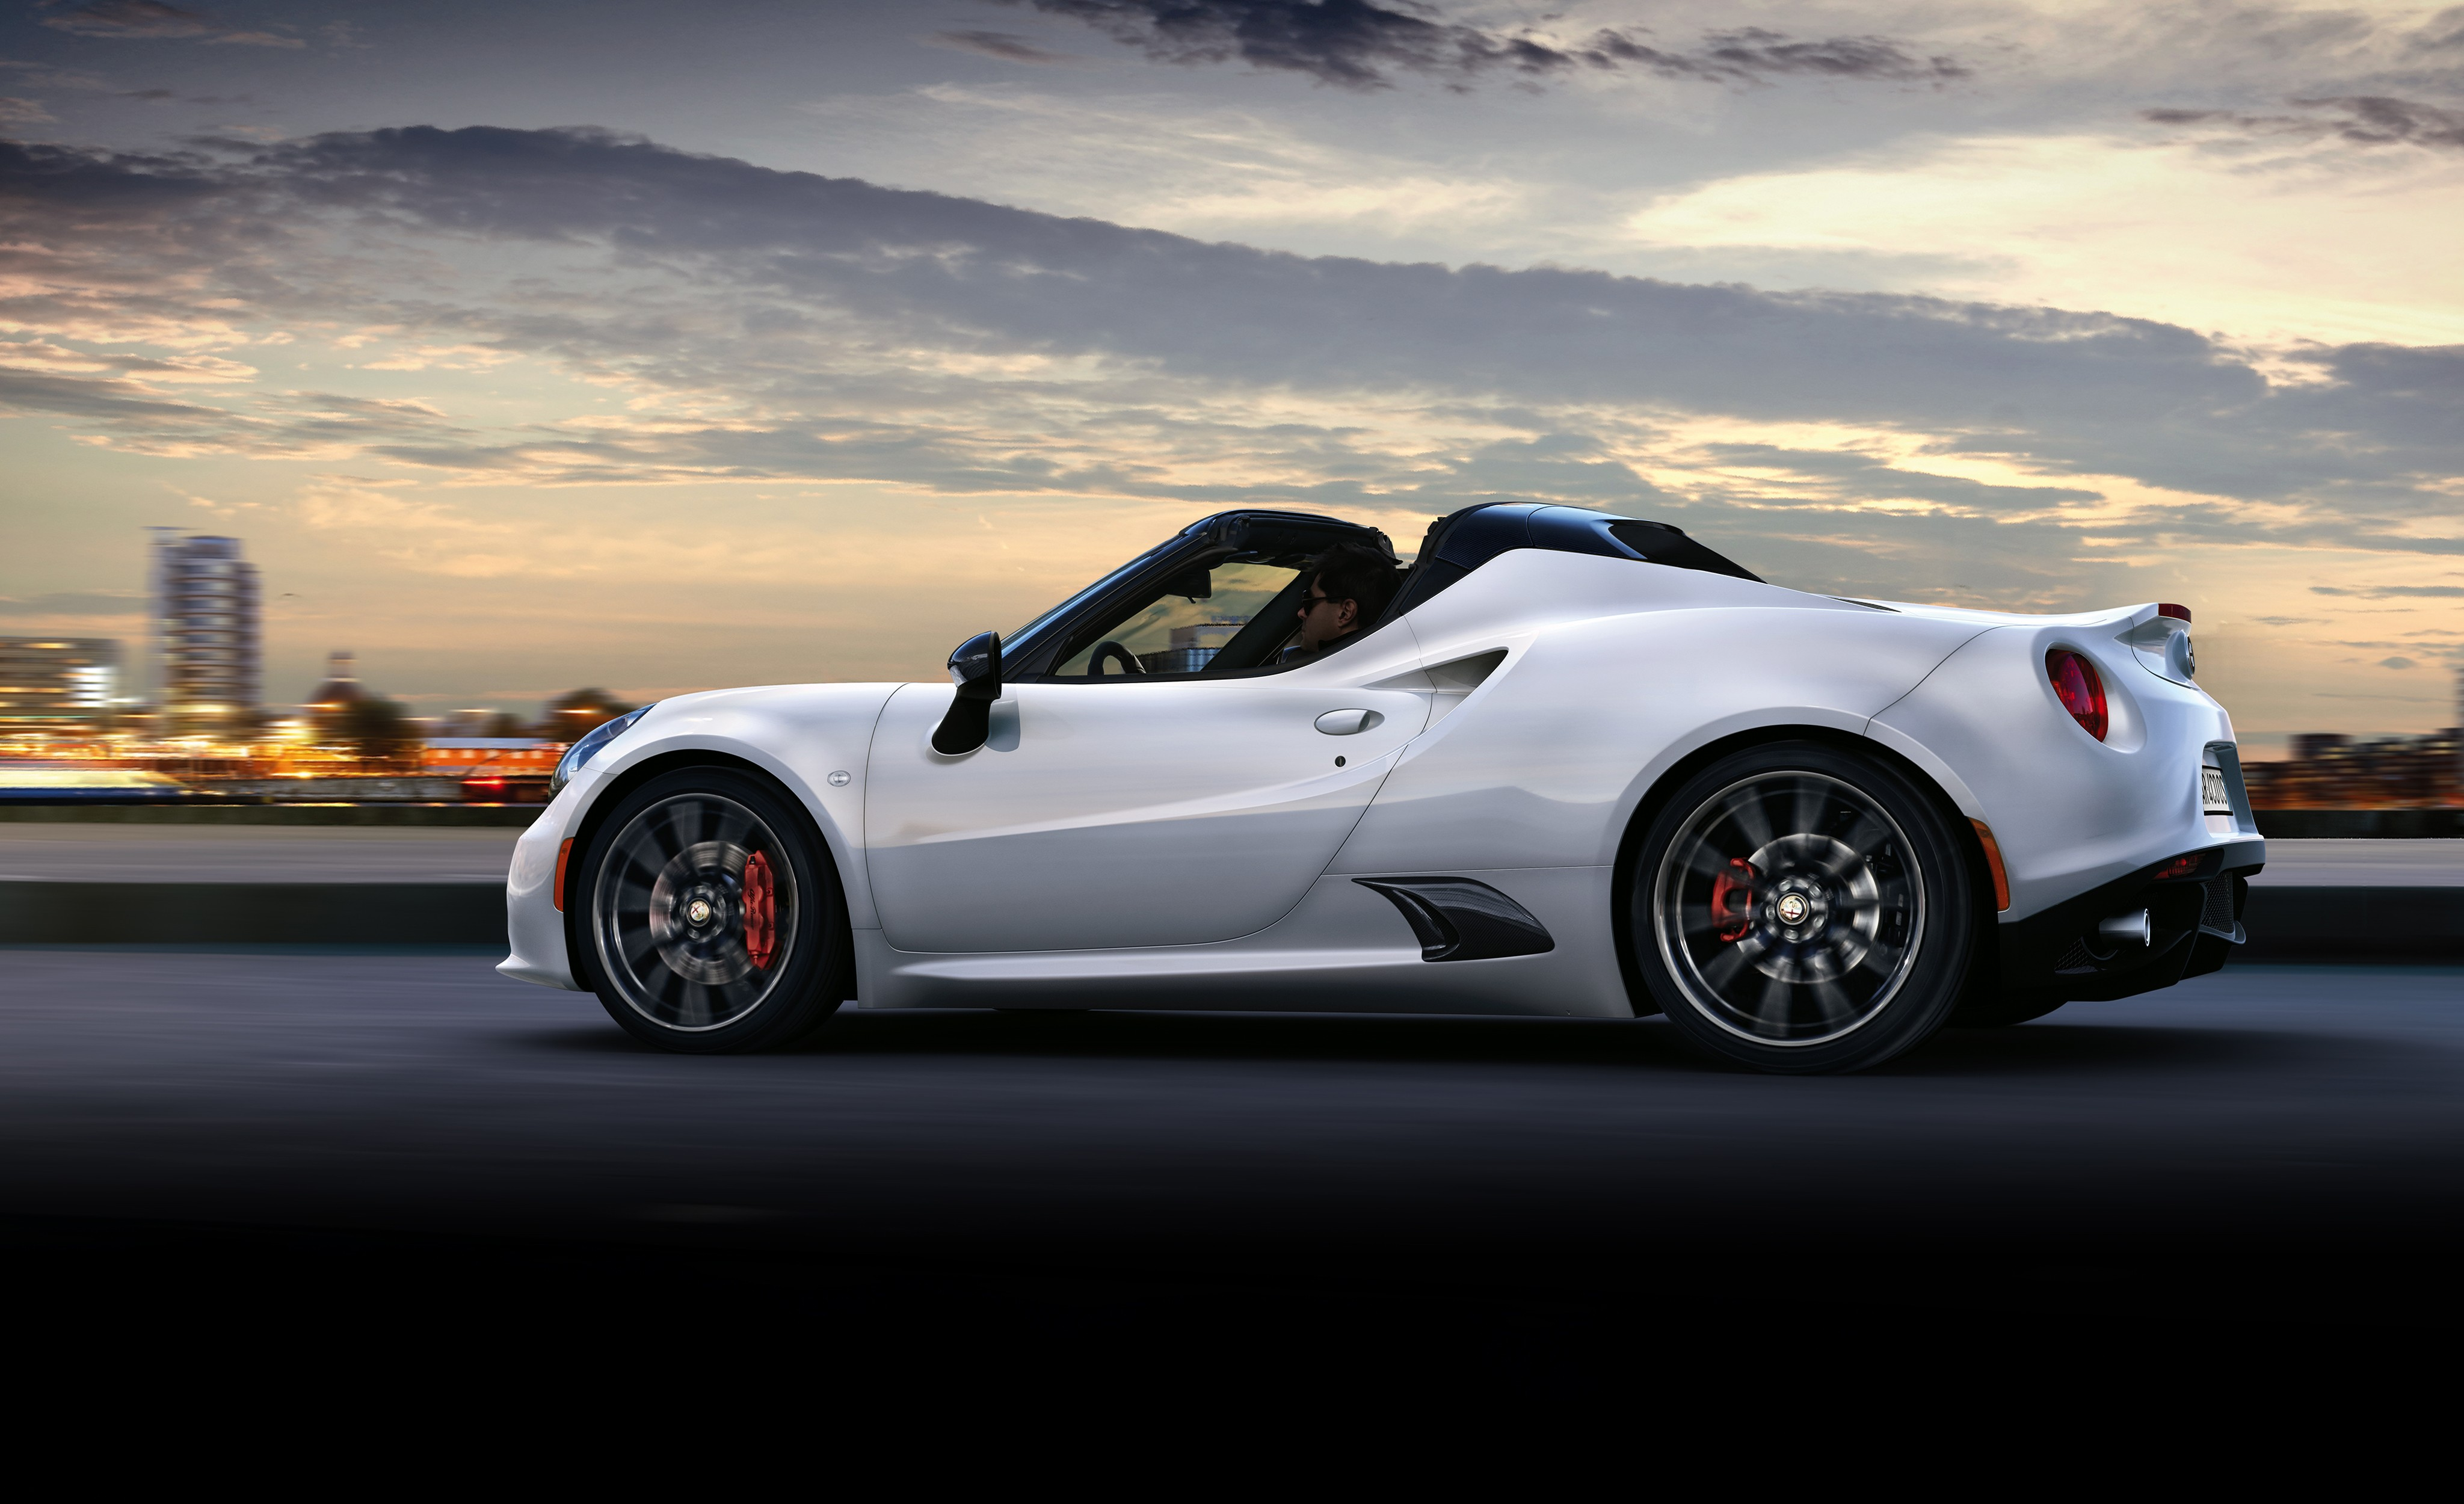 Alfa Romeo 4c 2020 Release Date and Price